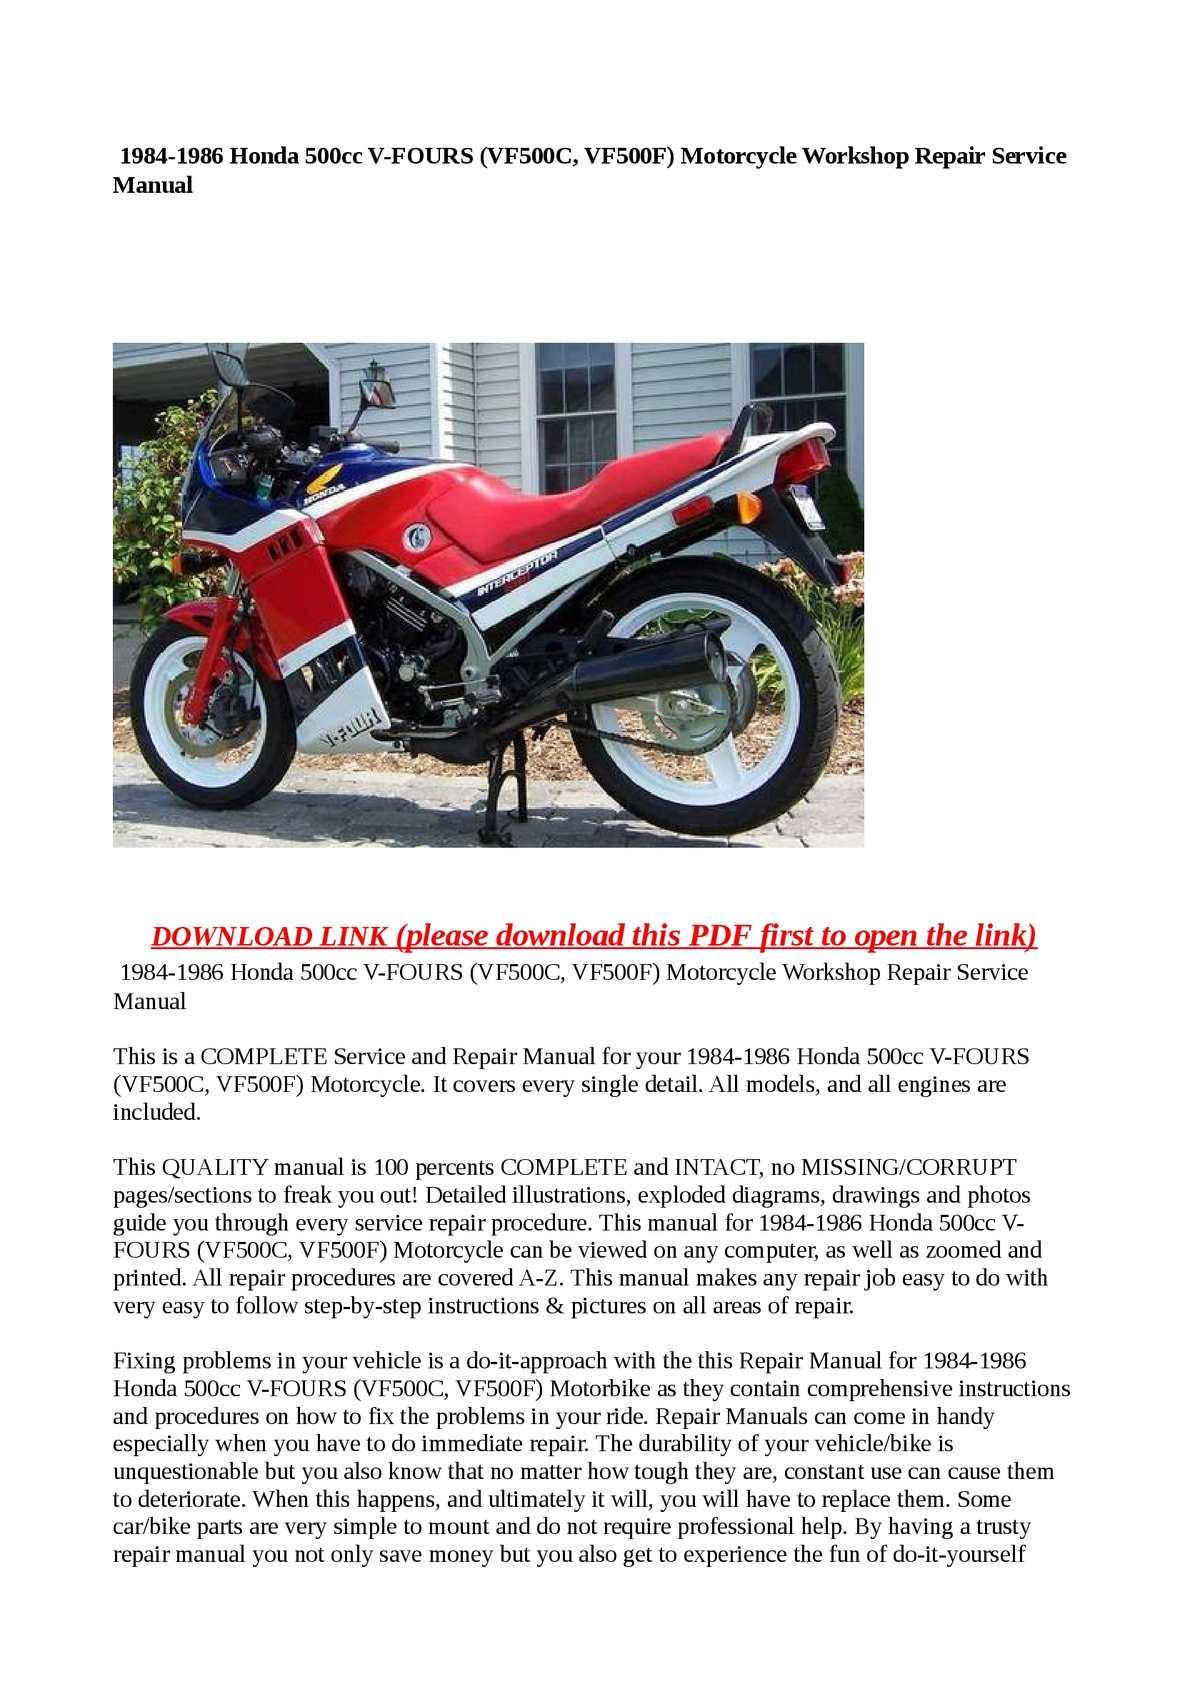 Honda Vf500 Wiring Diagram Trusted Diagrams 1985 Interceptor 1986 Vf500f Diy Enthusiasts U2022 Cb350